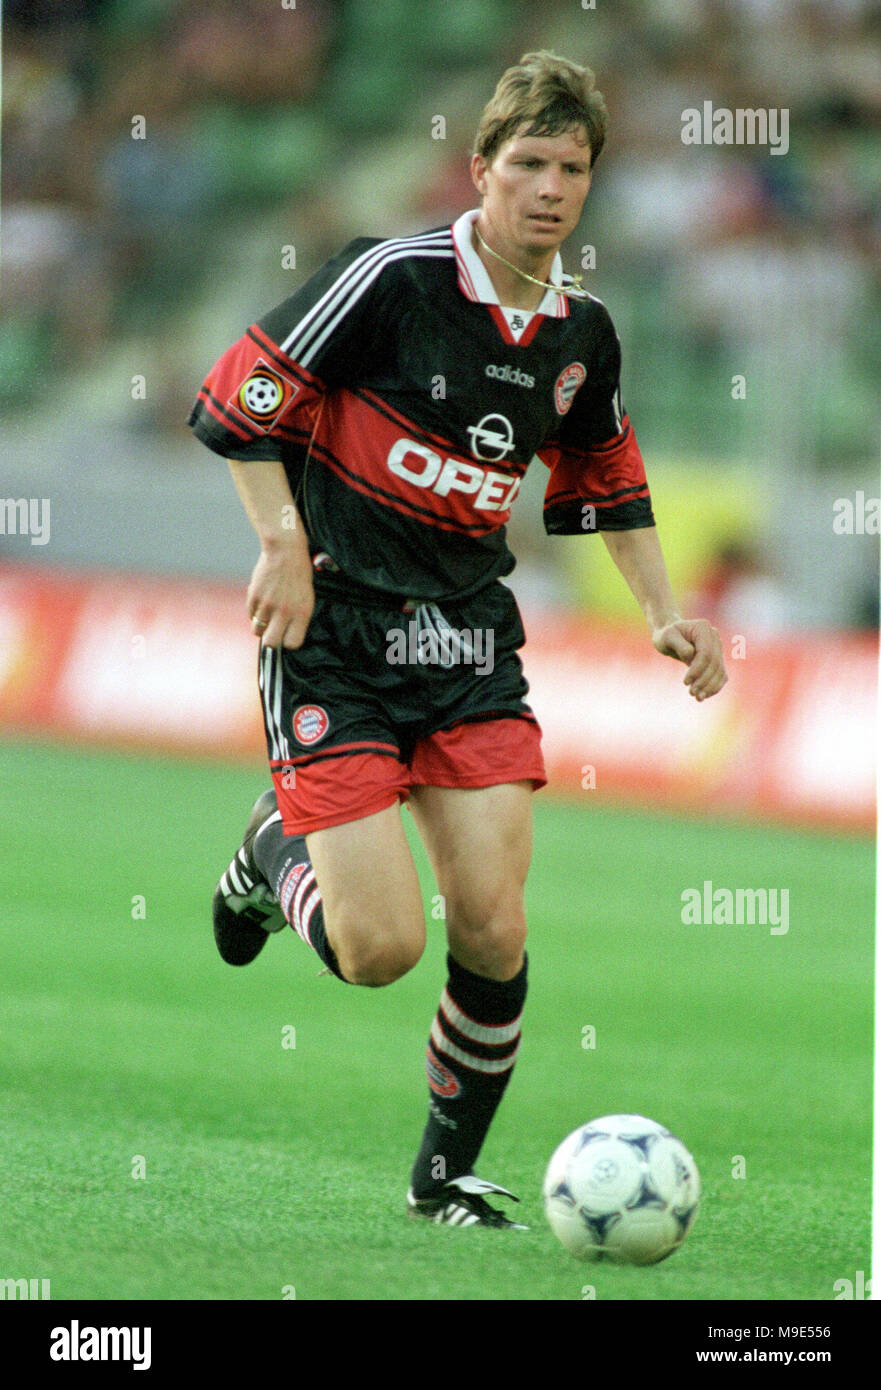 BayArena Leverkusen, Germany, 8.8.1998, German Liga-Cup Final, FC Bayern Munich vs VfB Stuttgart --- Michael TARNAT  (Munich) Stock Photo